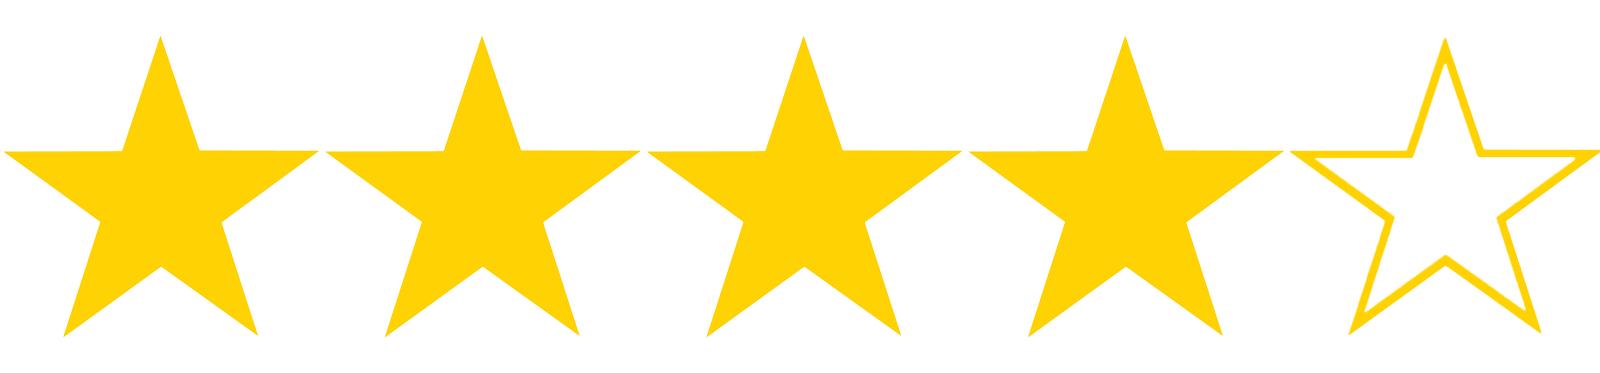 4starsVeryGood